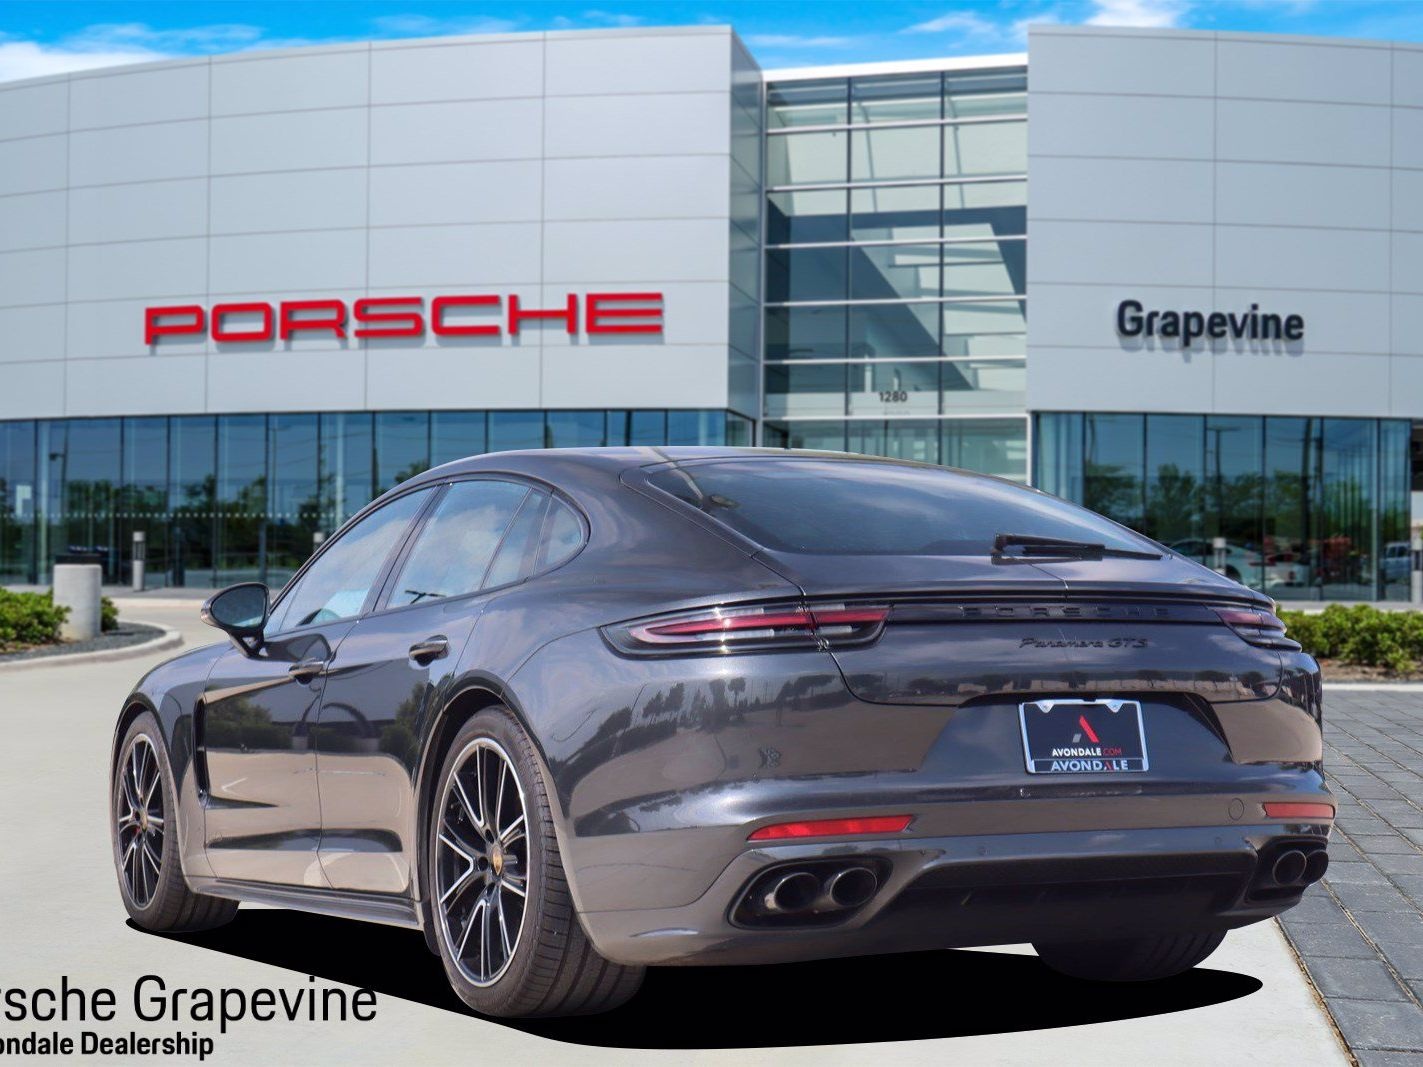 2019 Porsche Panamera GTS – 4